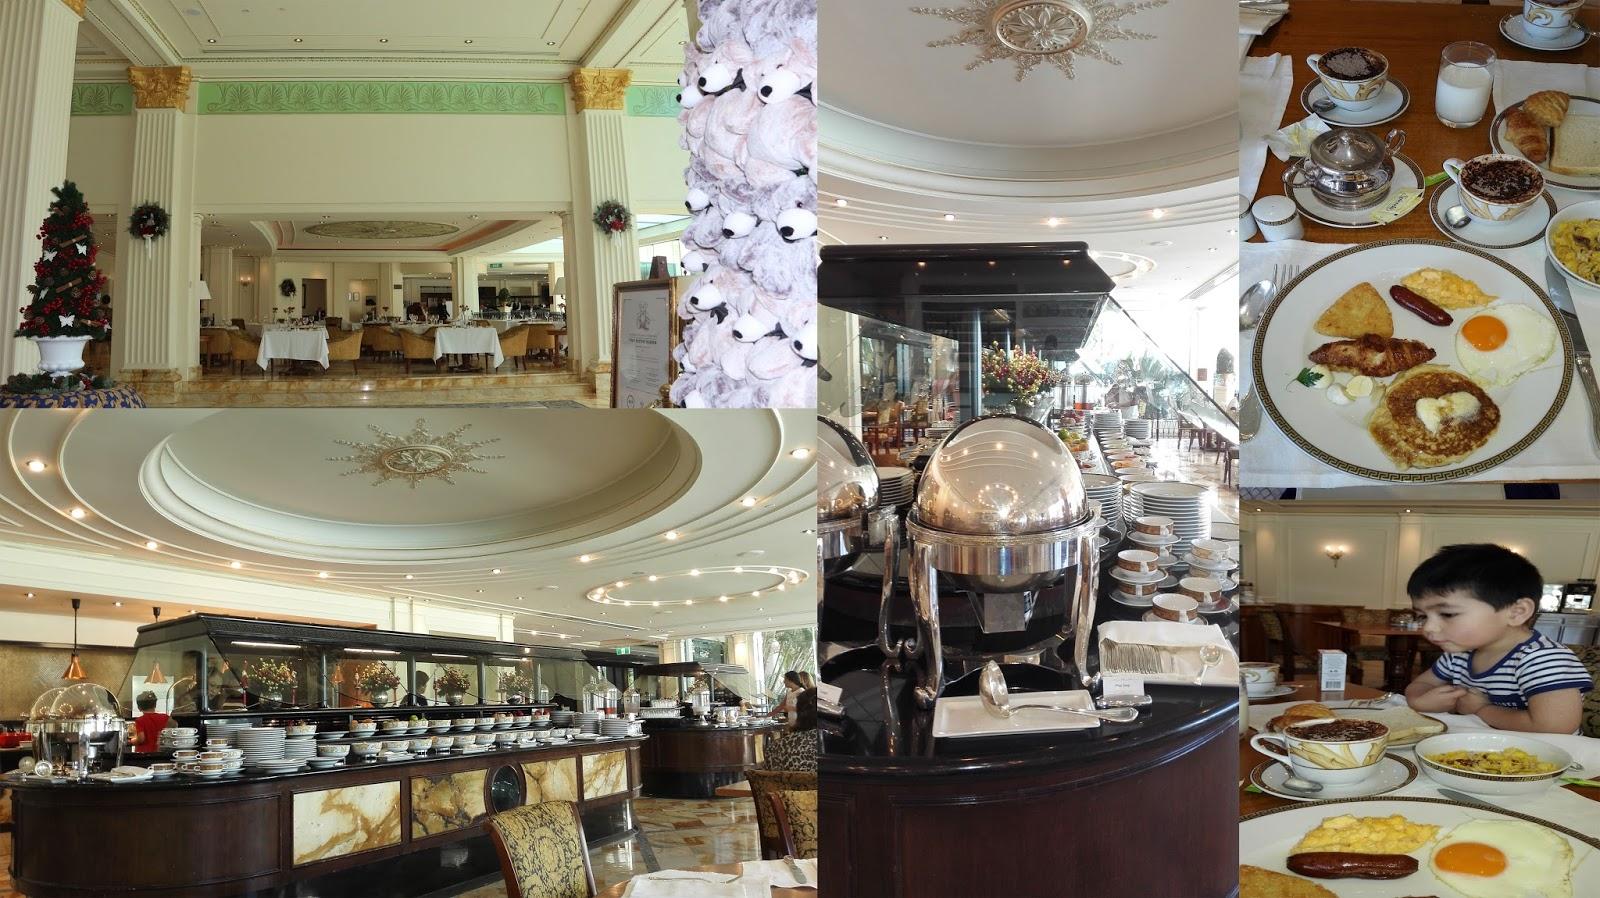 Palazzo Versace breakfast